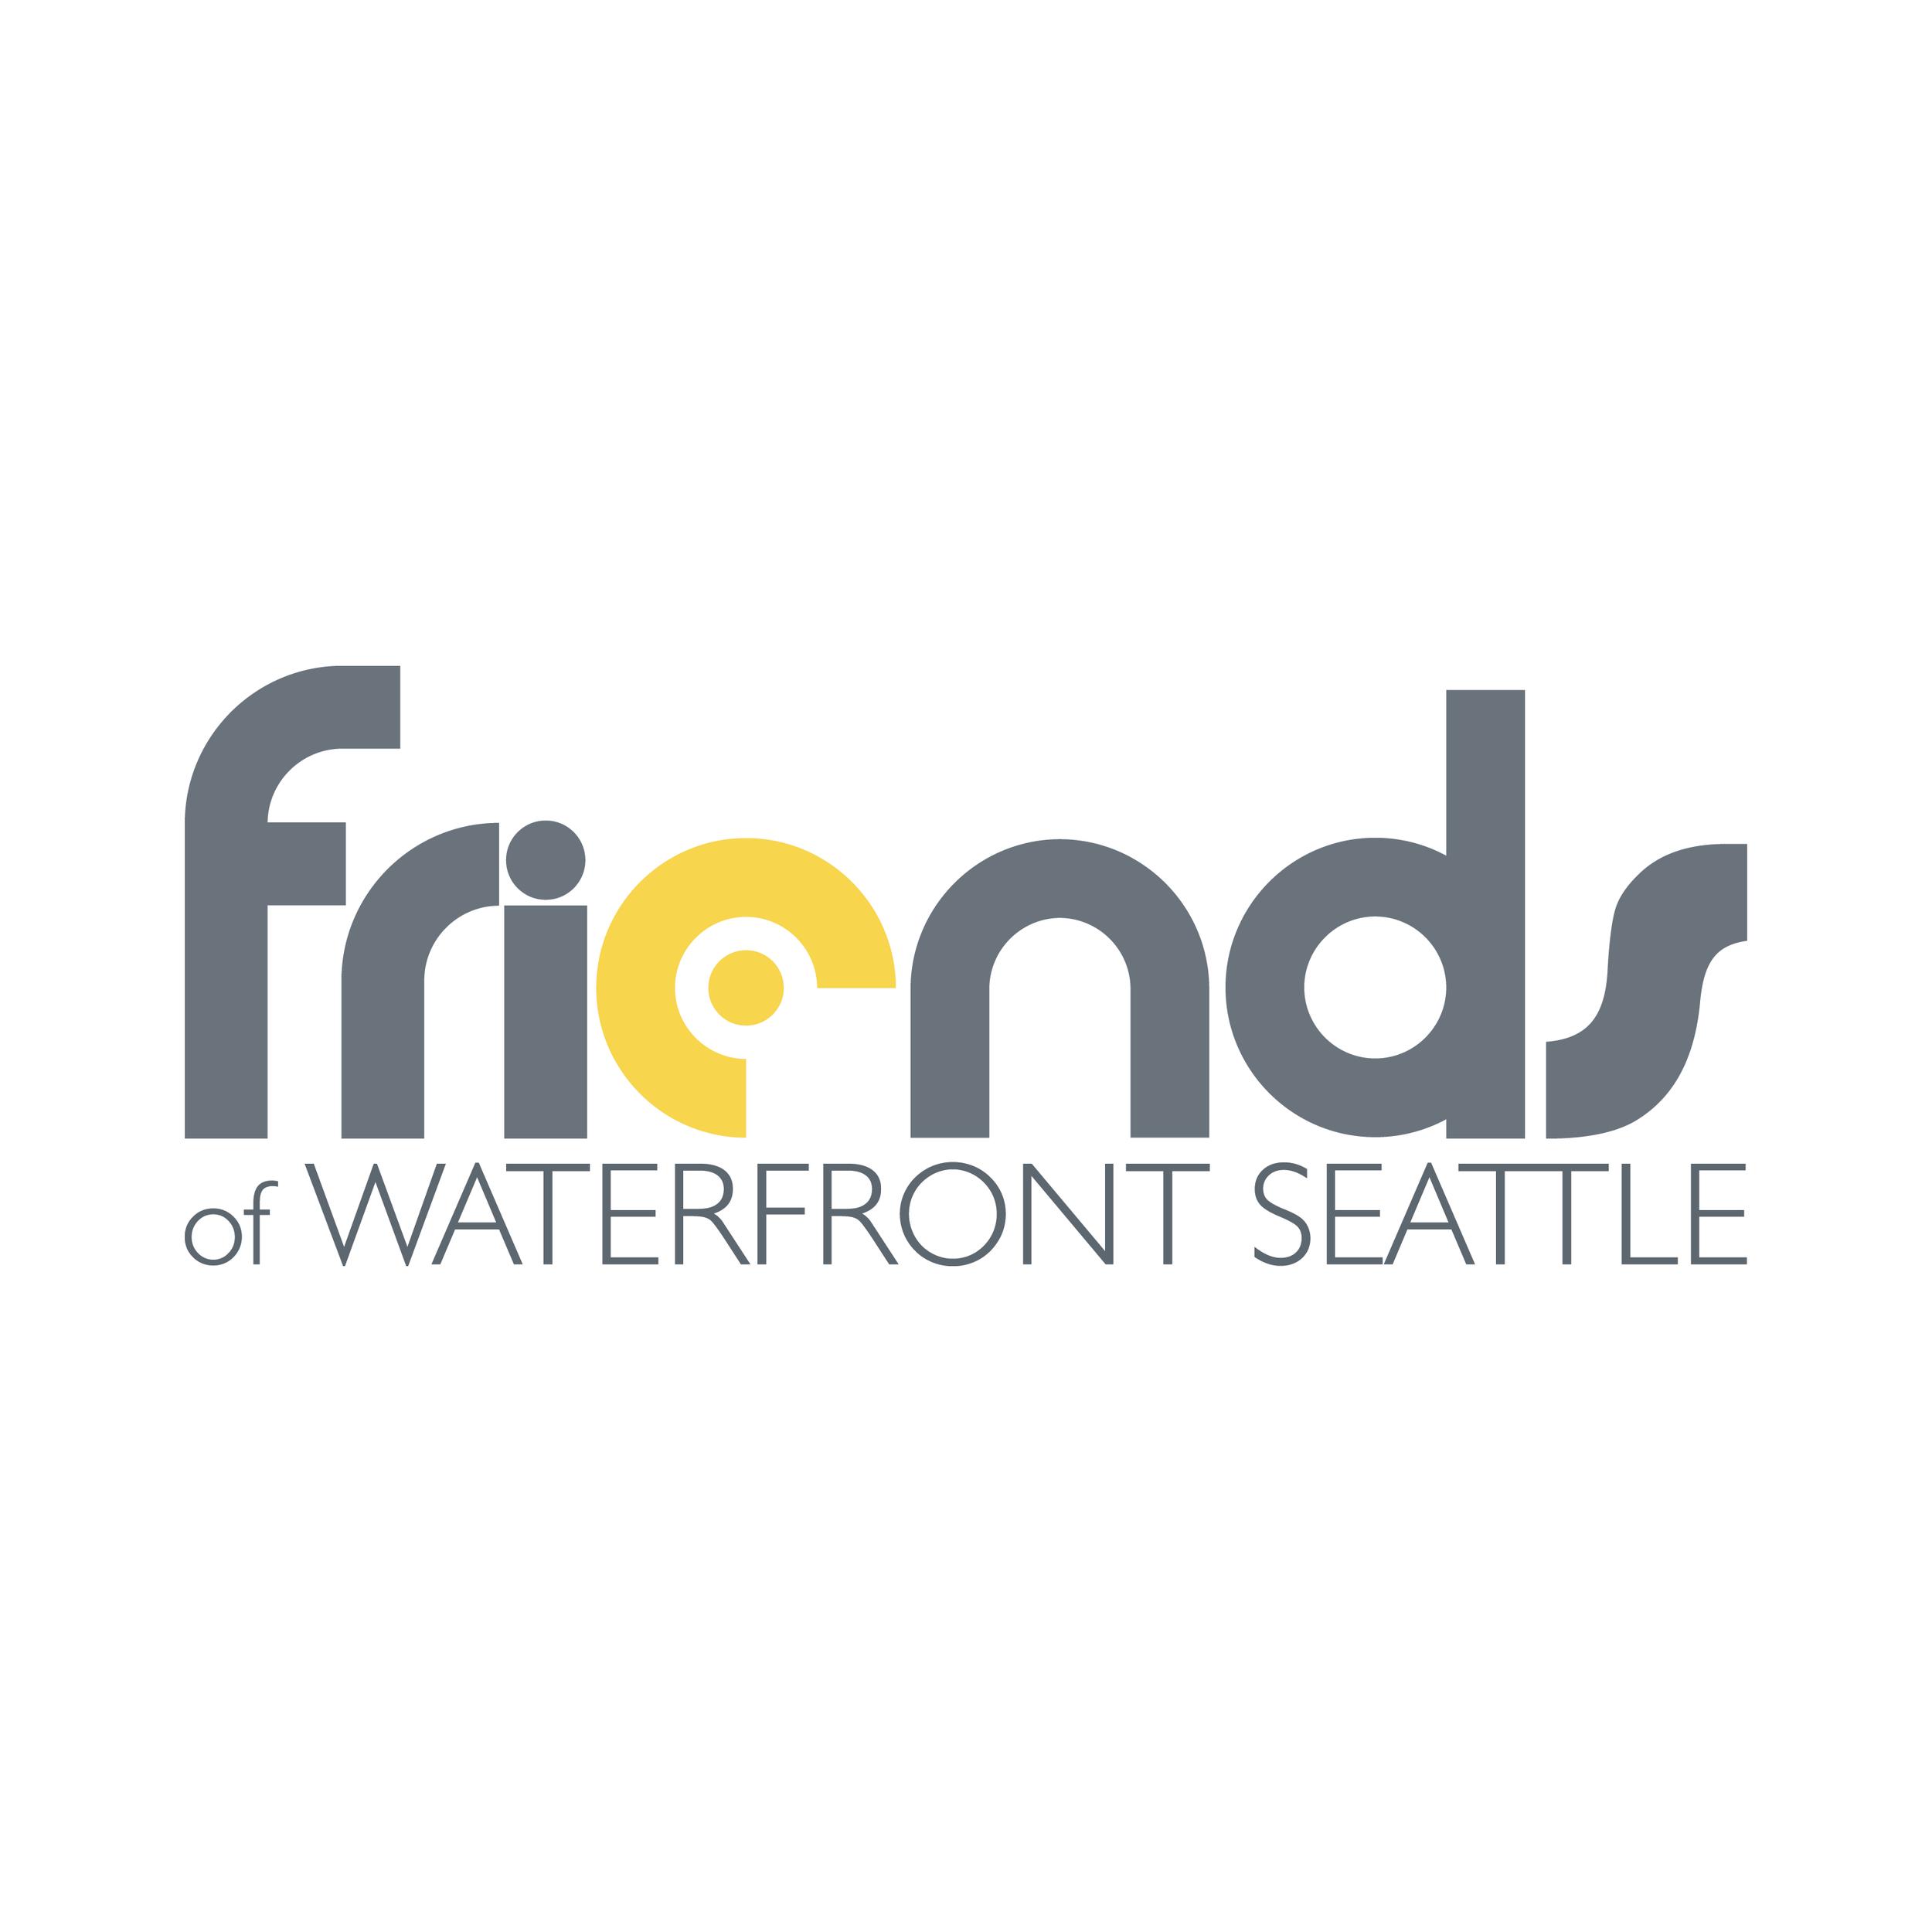 Friends-Logo-GrayYellow.png